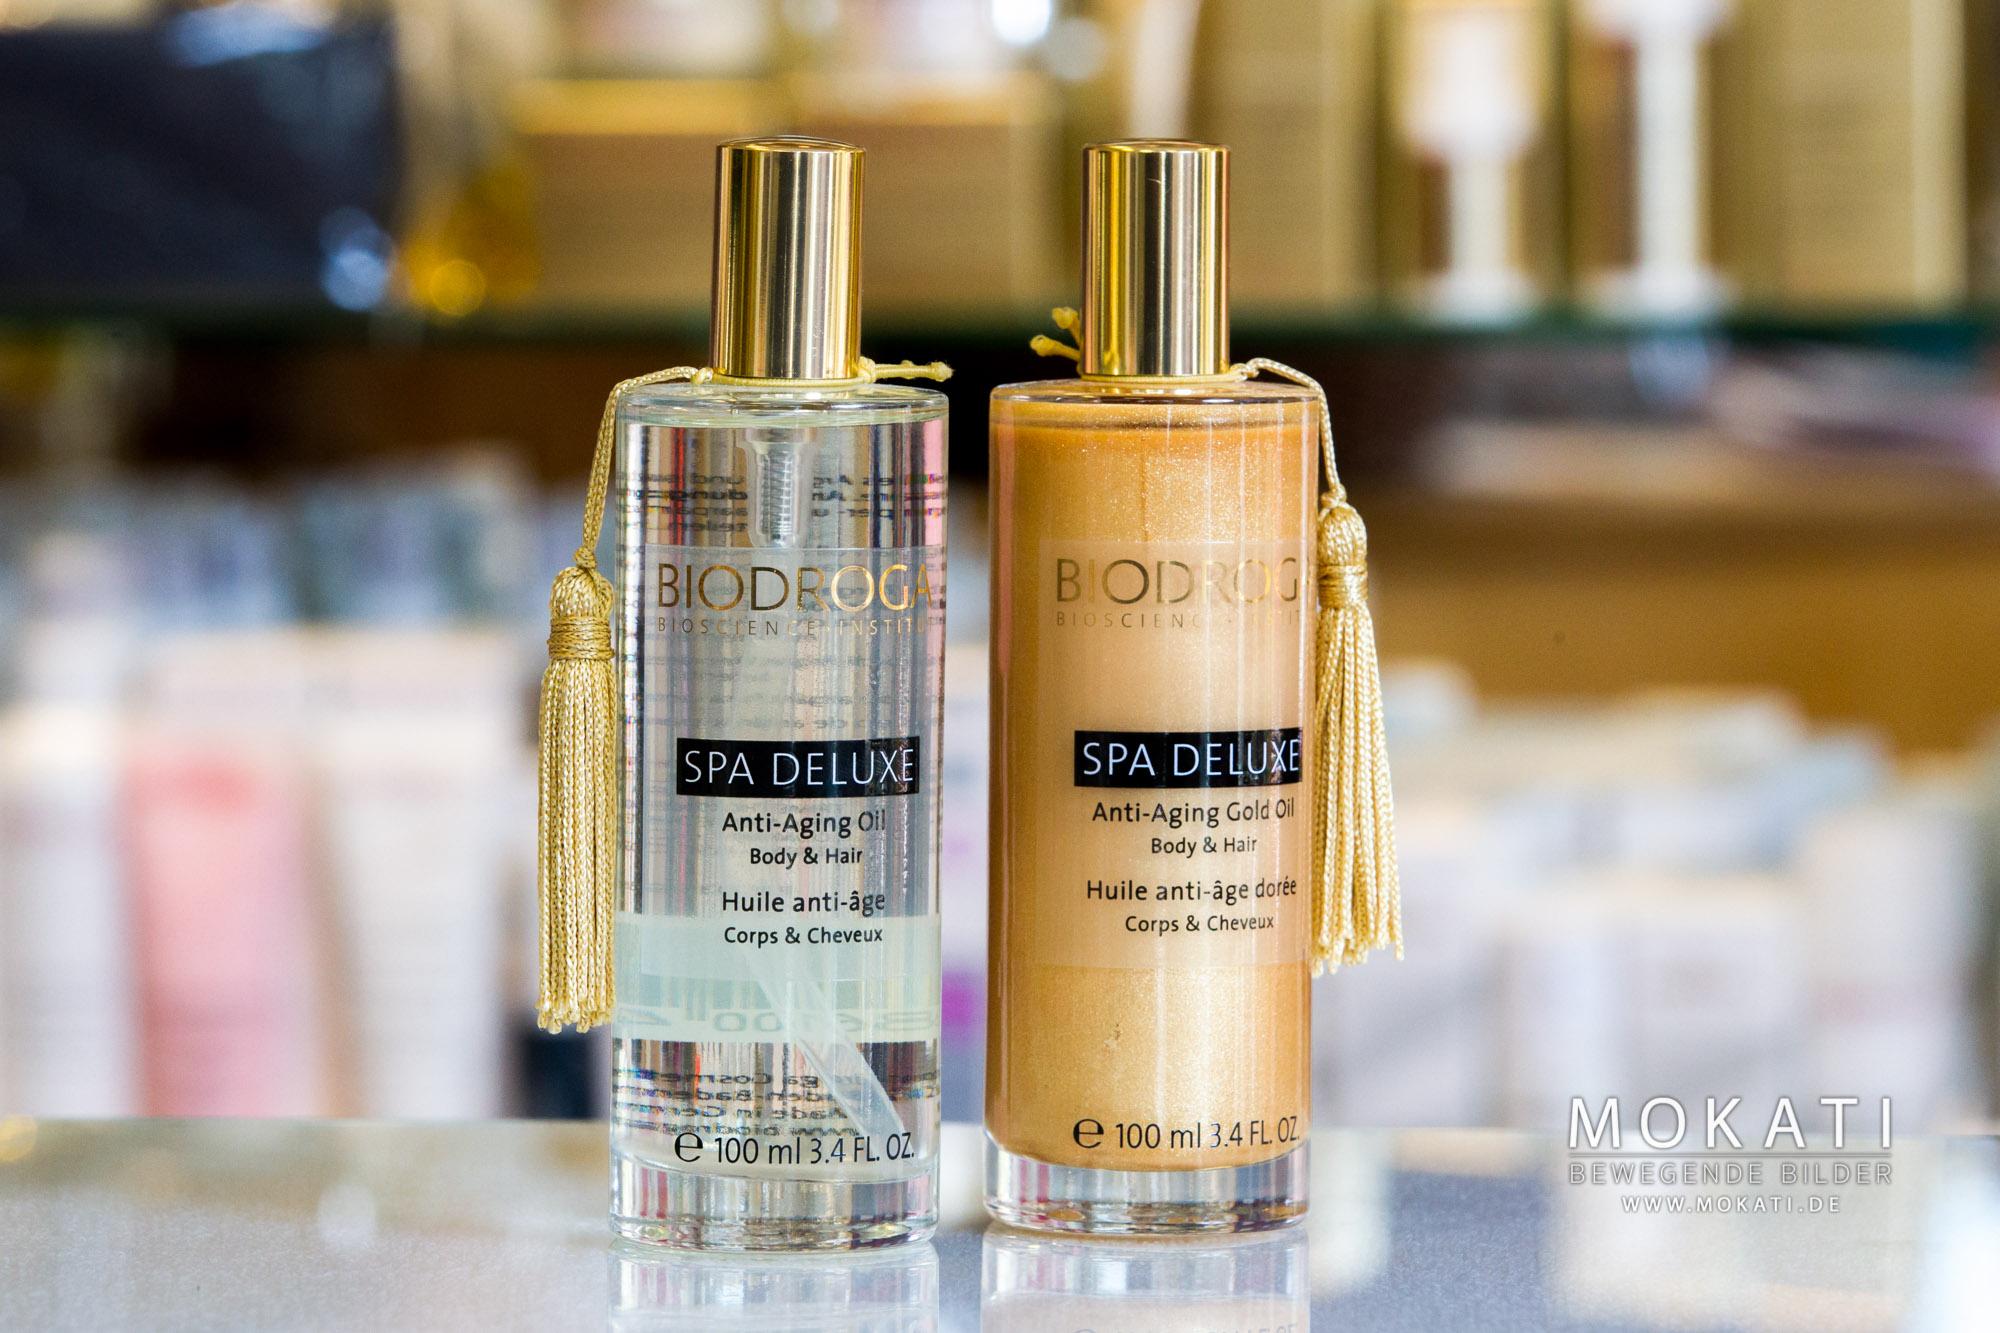 Redröh - Kosmetikstudio SPA DELUXE Anti Aging Oil für Body & Hair